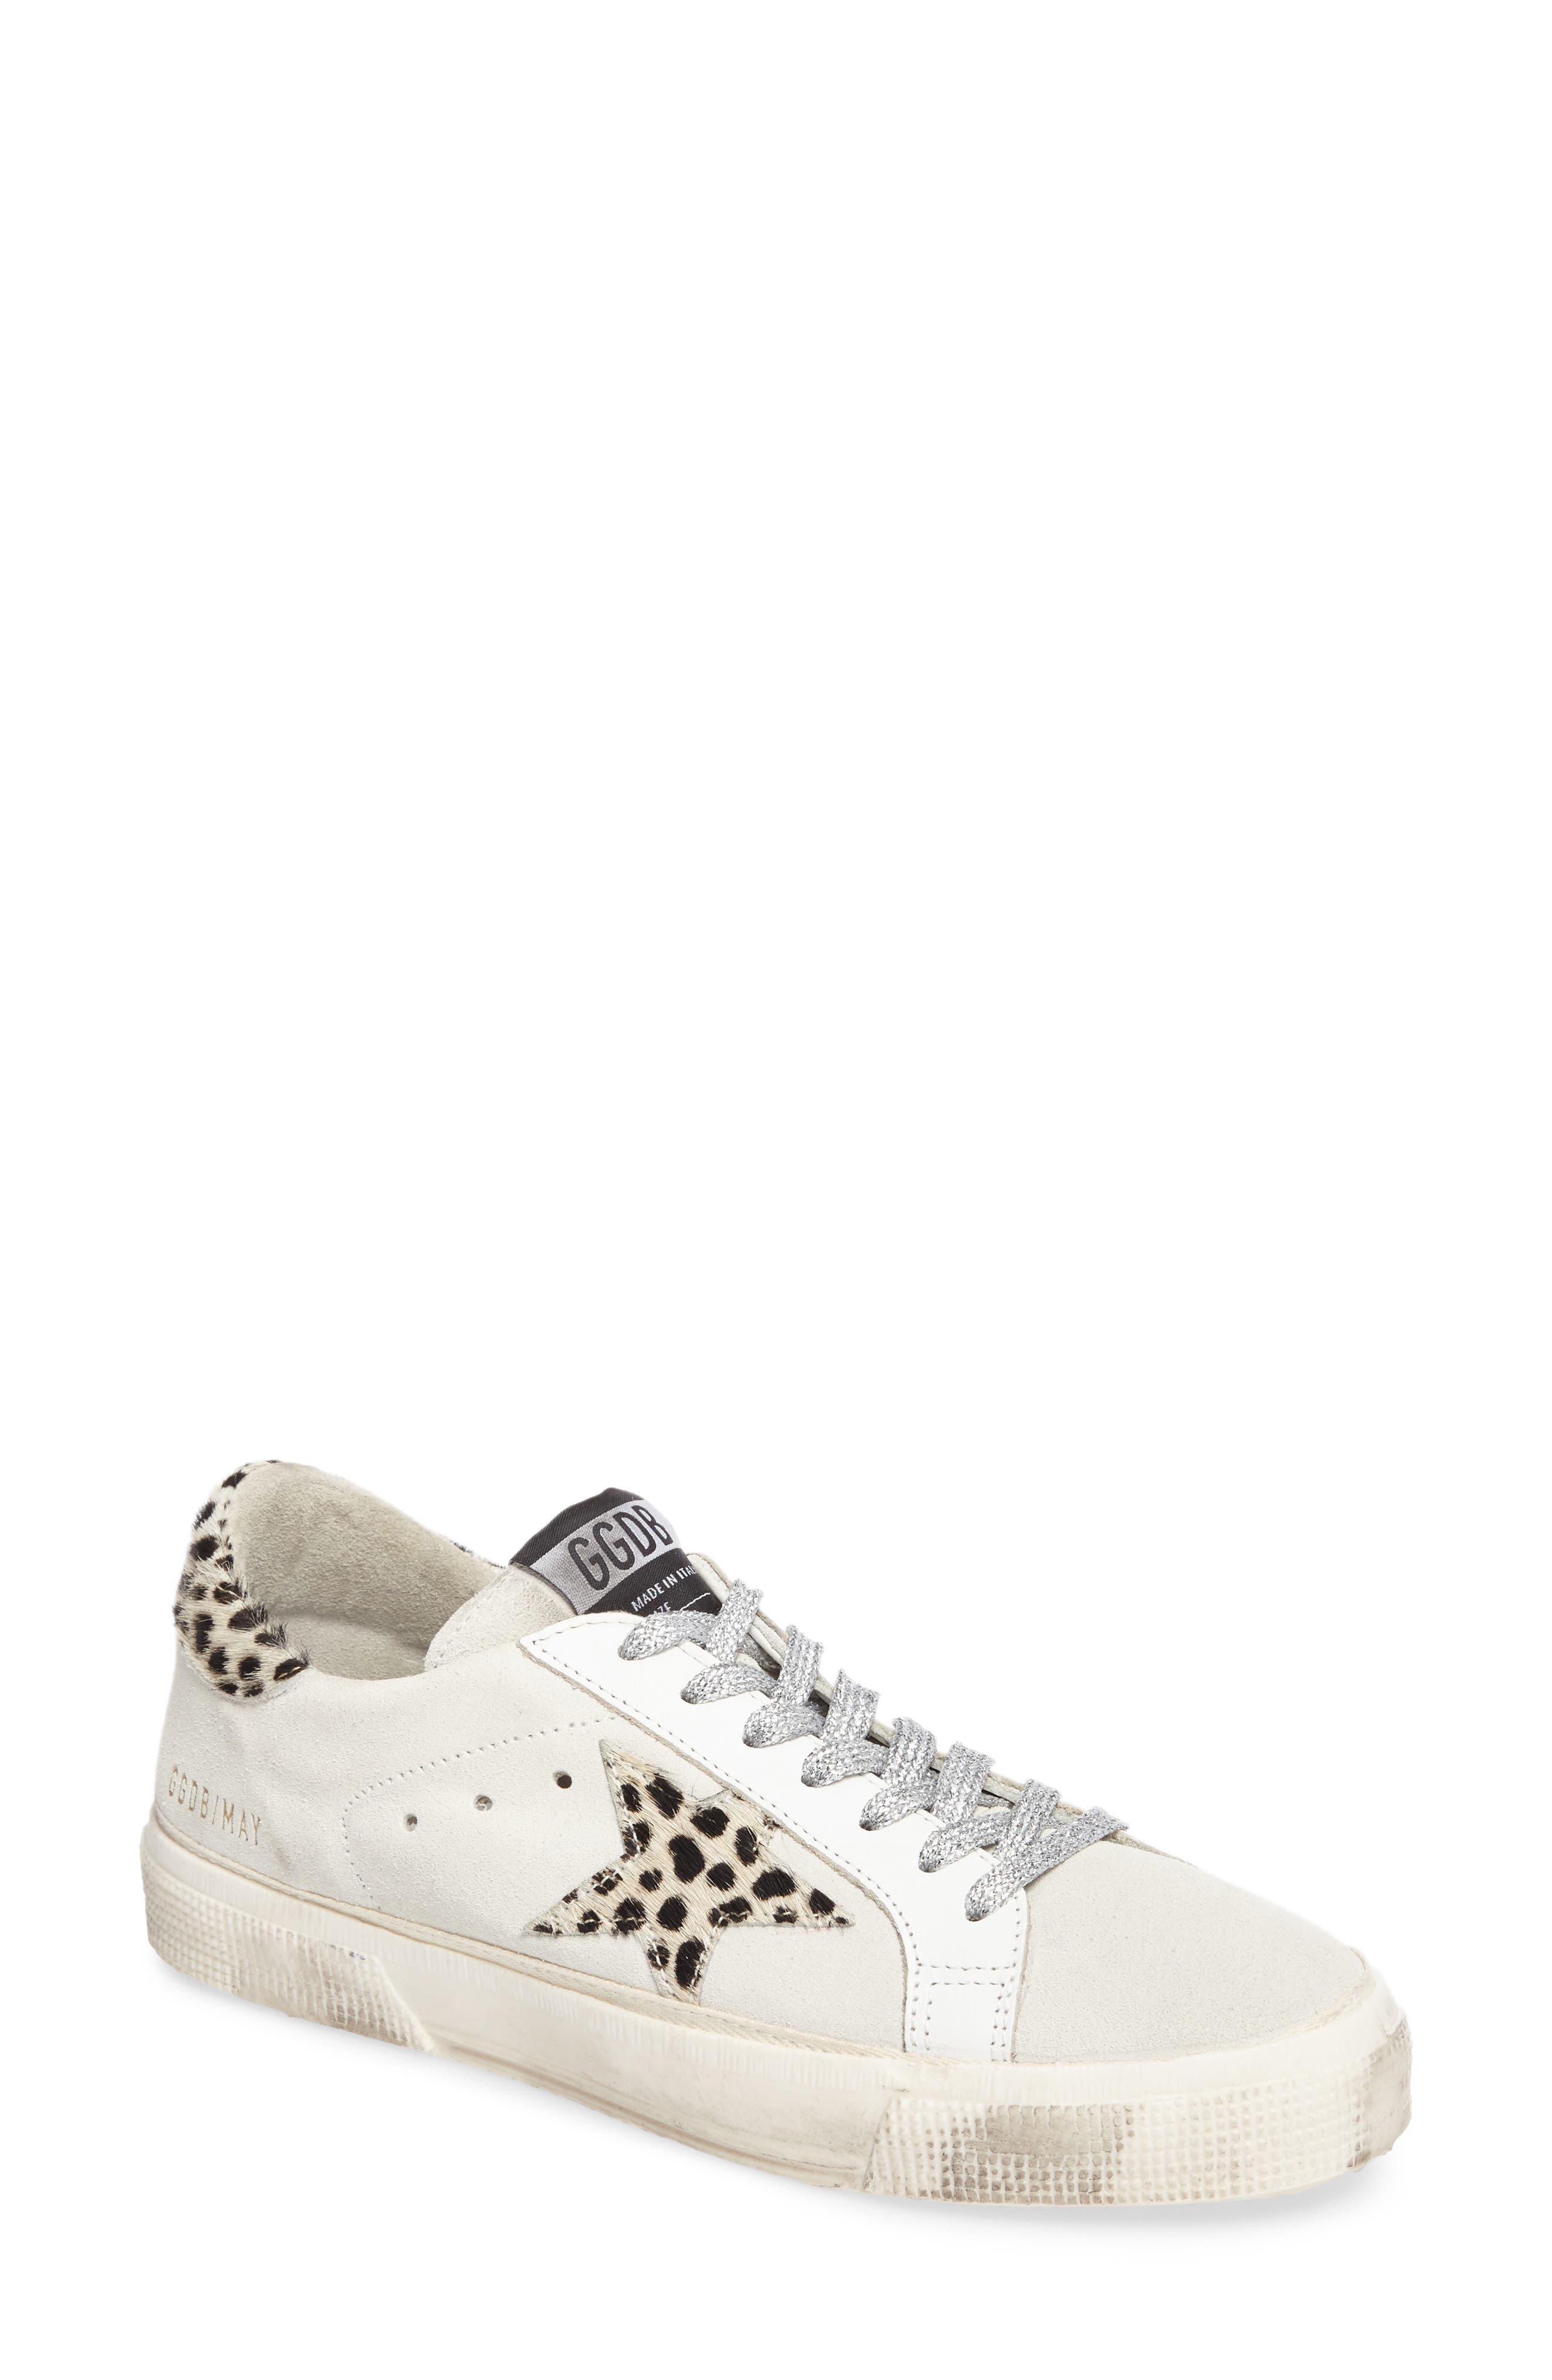 May Low Top Sneaker,                             Main thumbnail 1, color,                             100